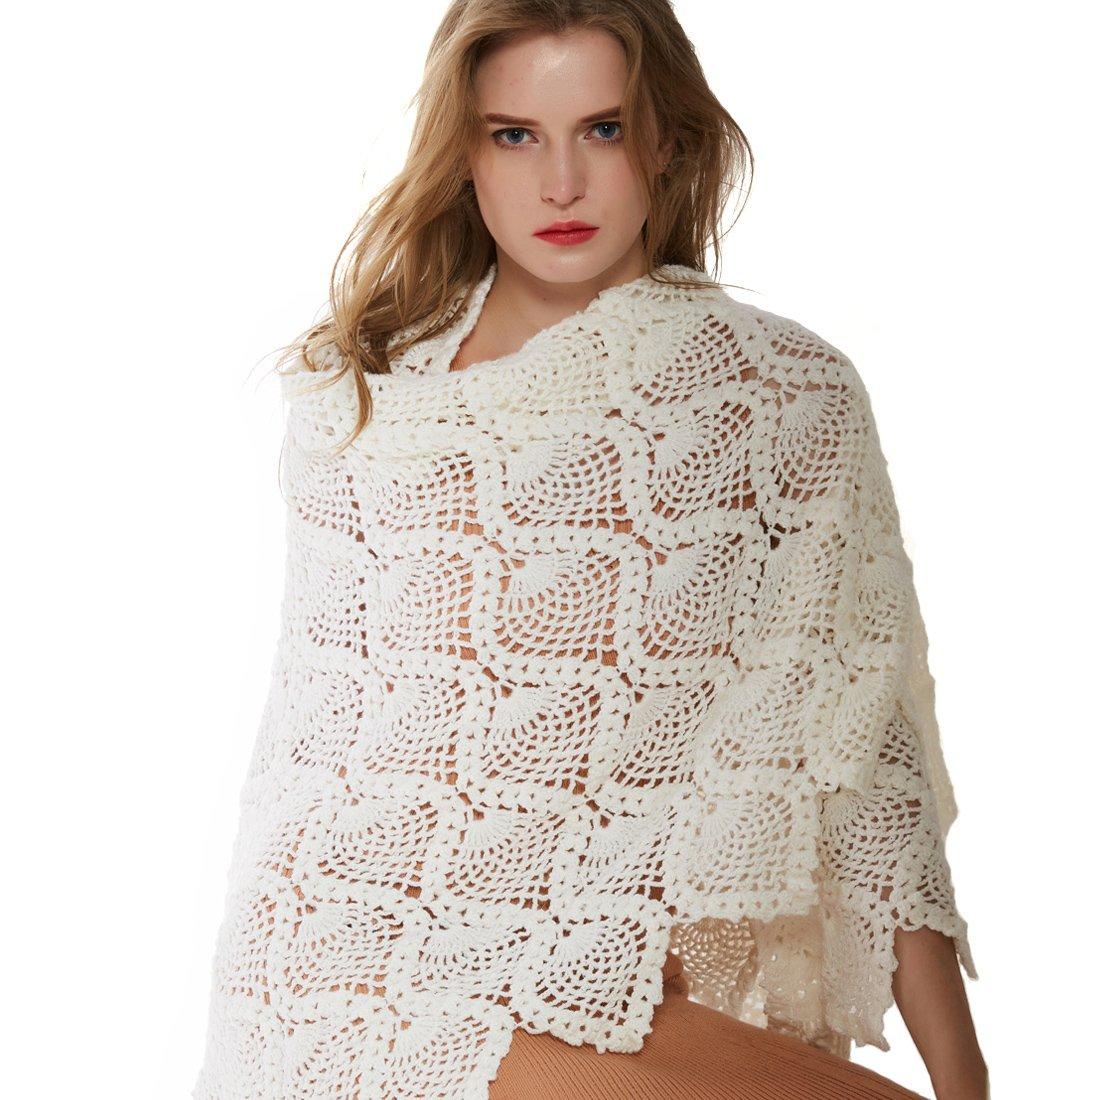 ZORJAR Wool Winter Scarf Crochet Warm Triangle Thick Fashion Scarves For Women(White)